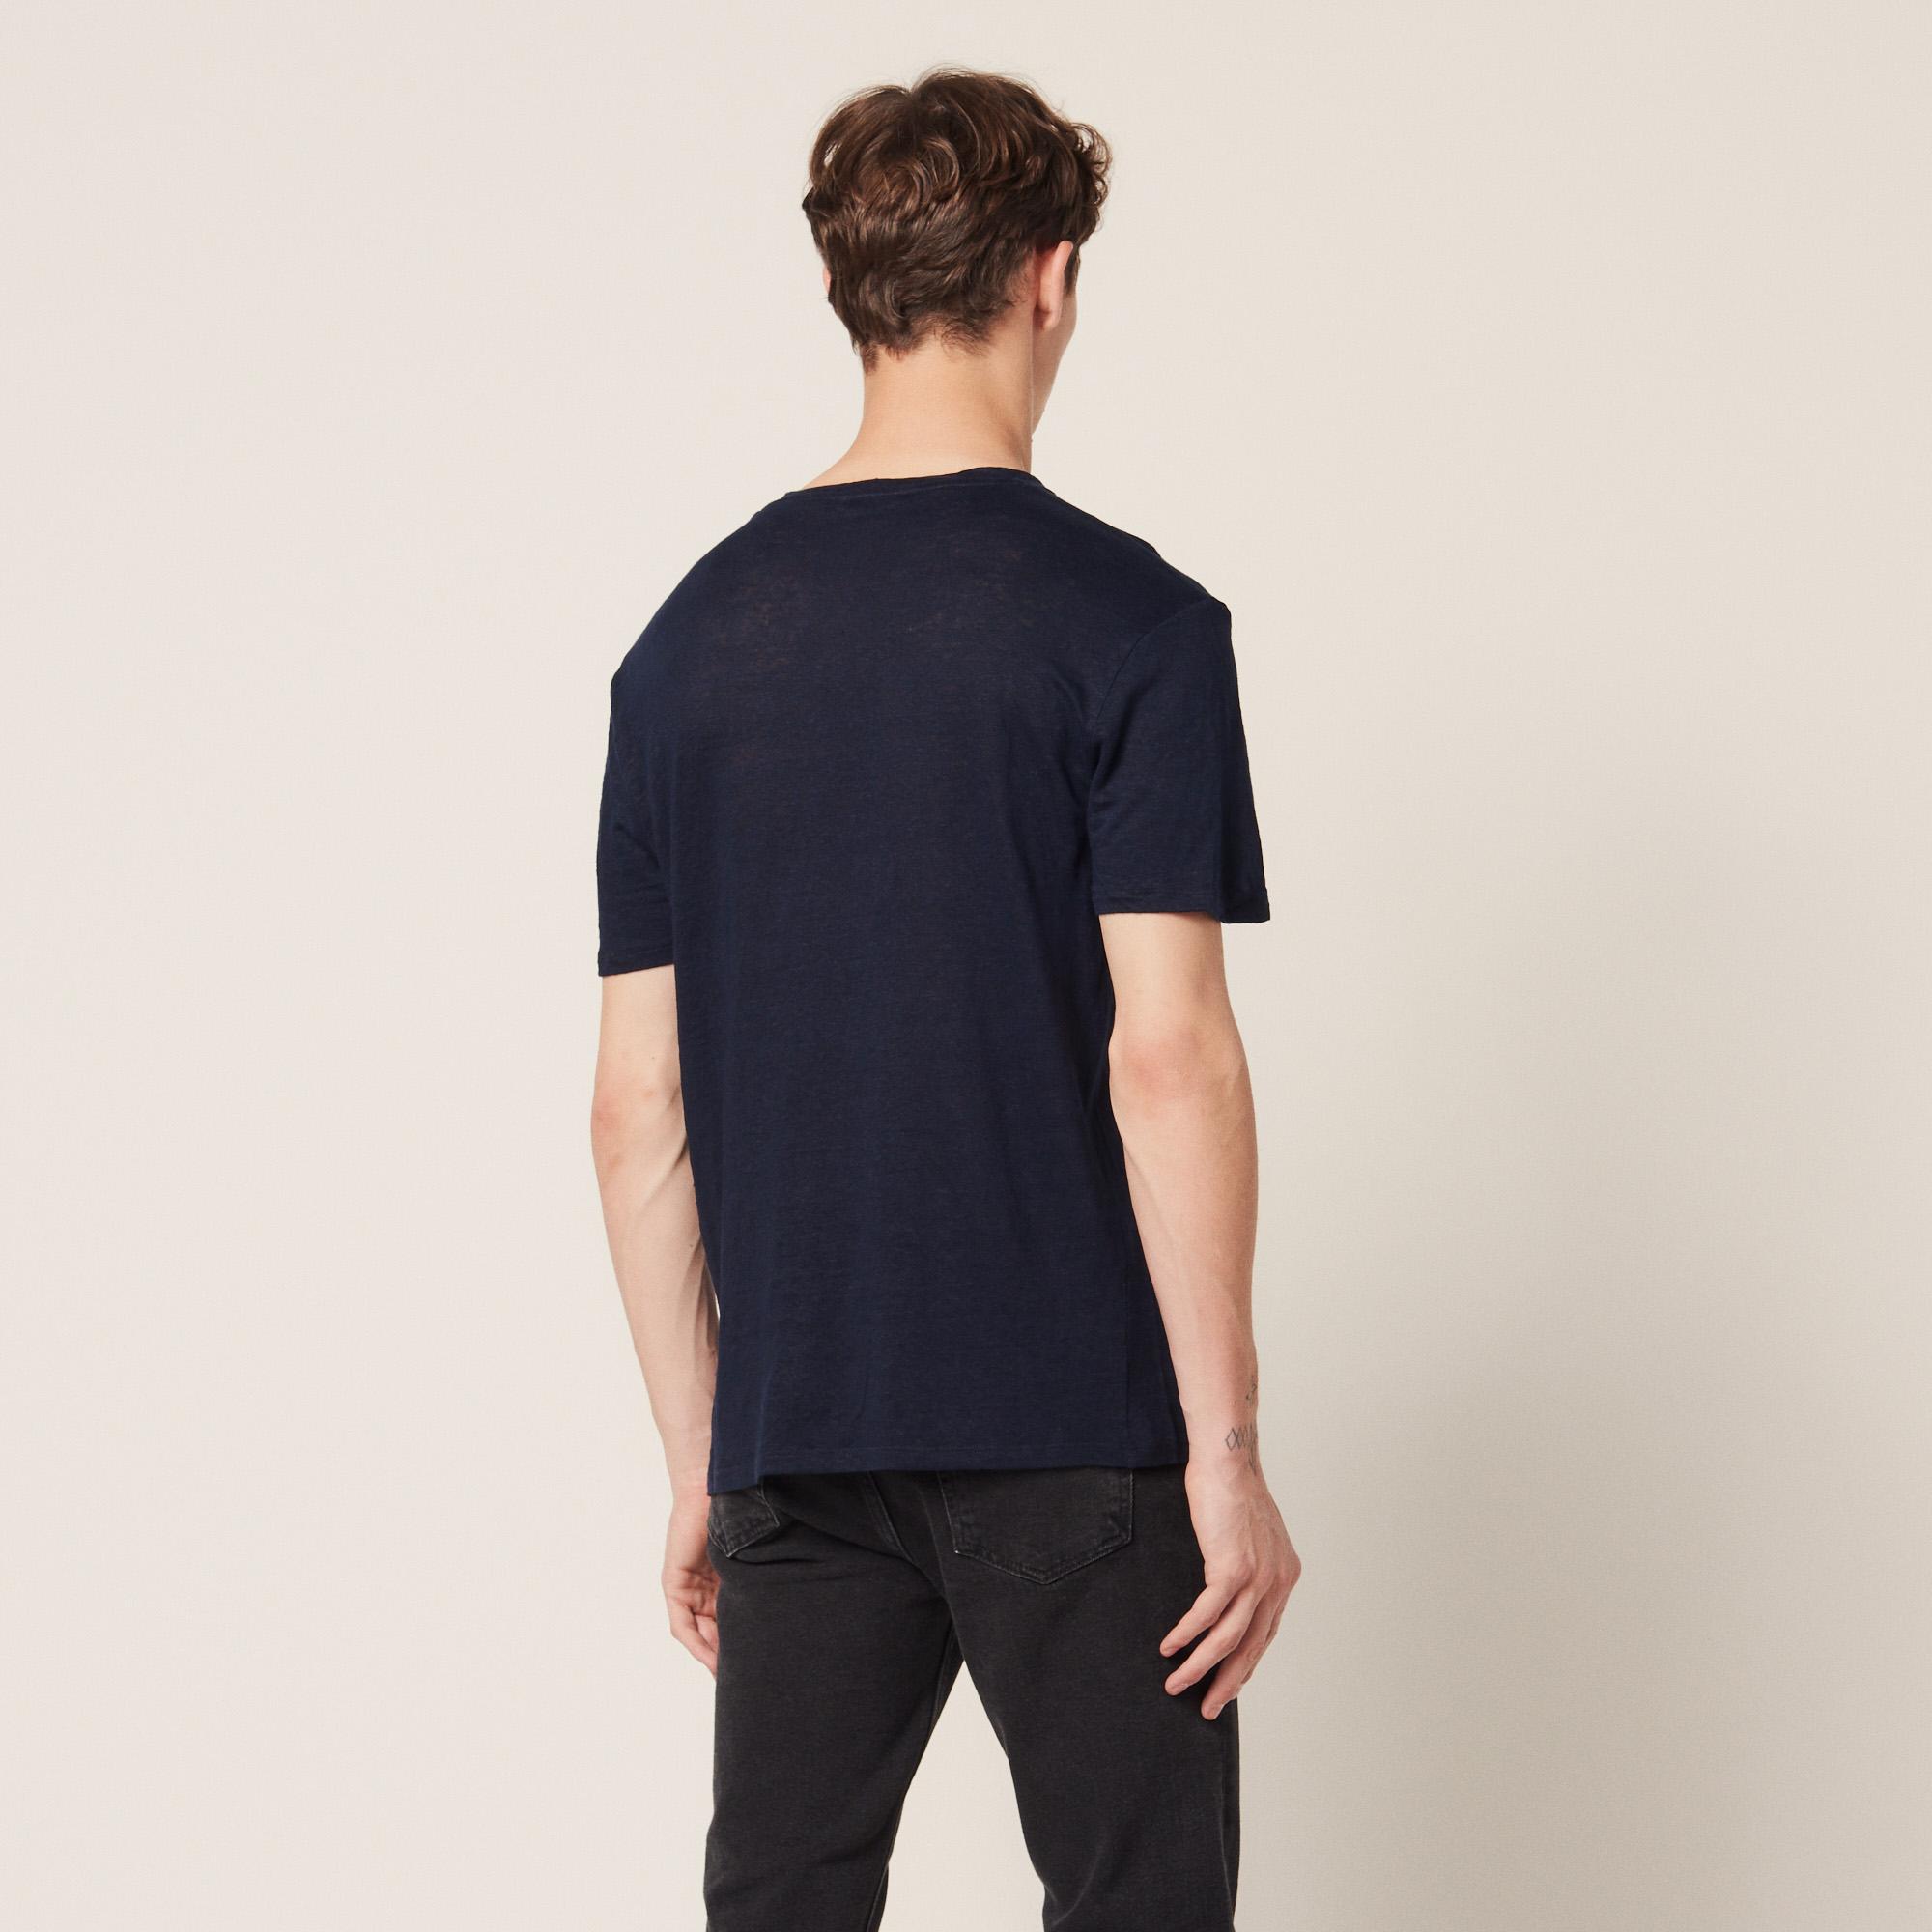 t shirt en lin t8641w marine t shirts polos sandro paris. Black Bedroom Furniture Sets. Home Design Ideas